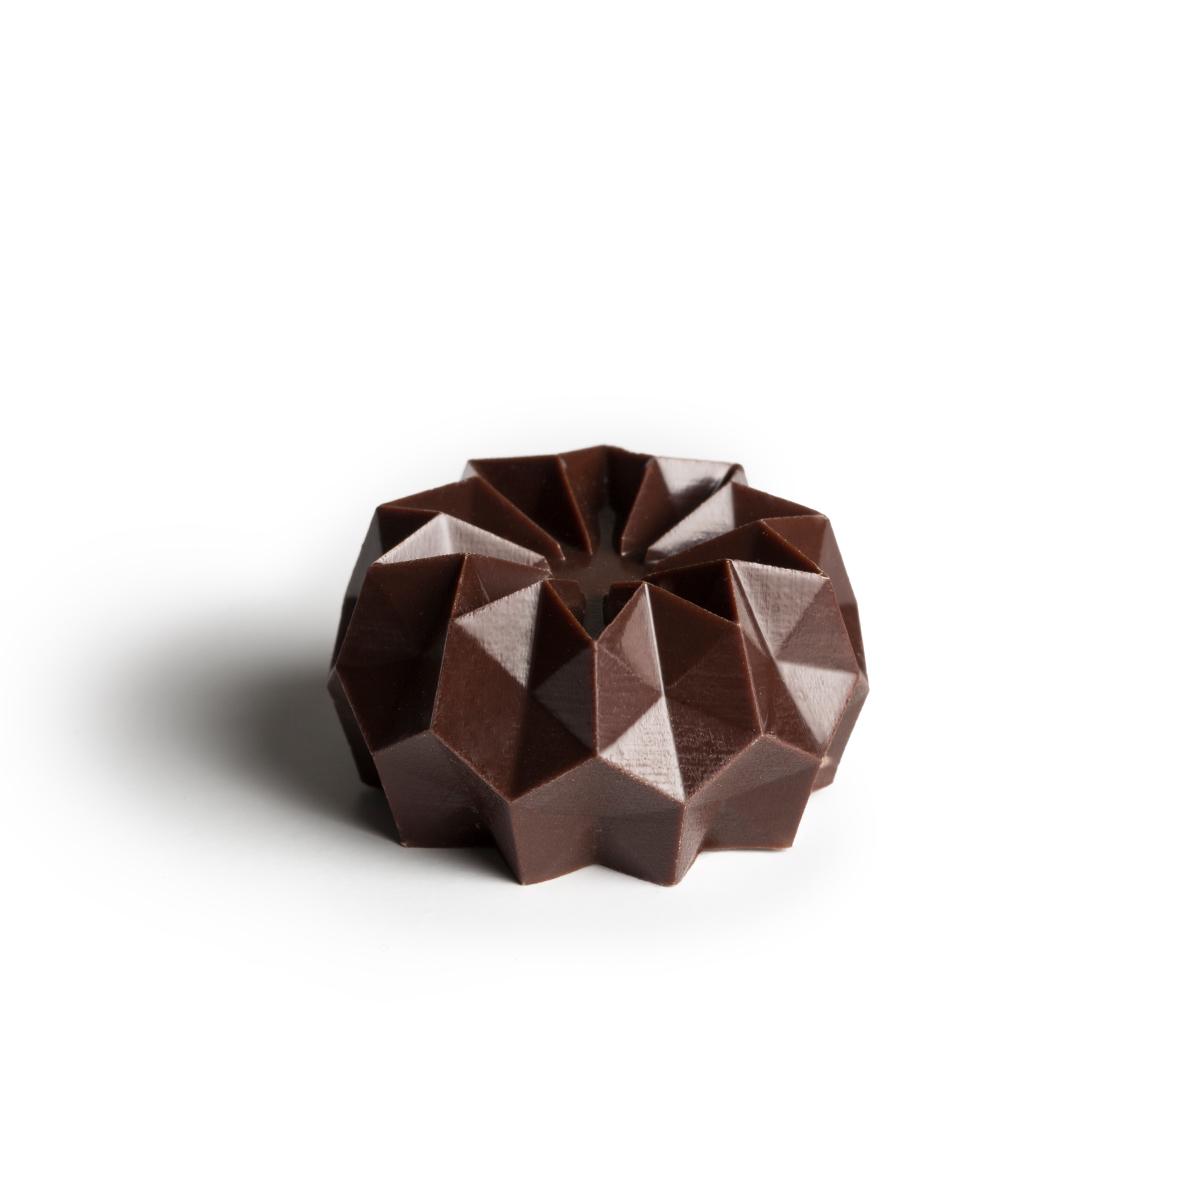 3D Printing Chocolates